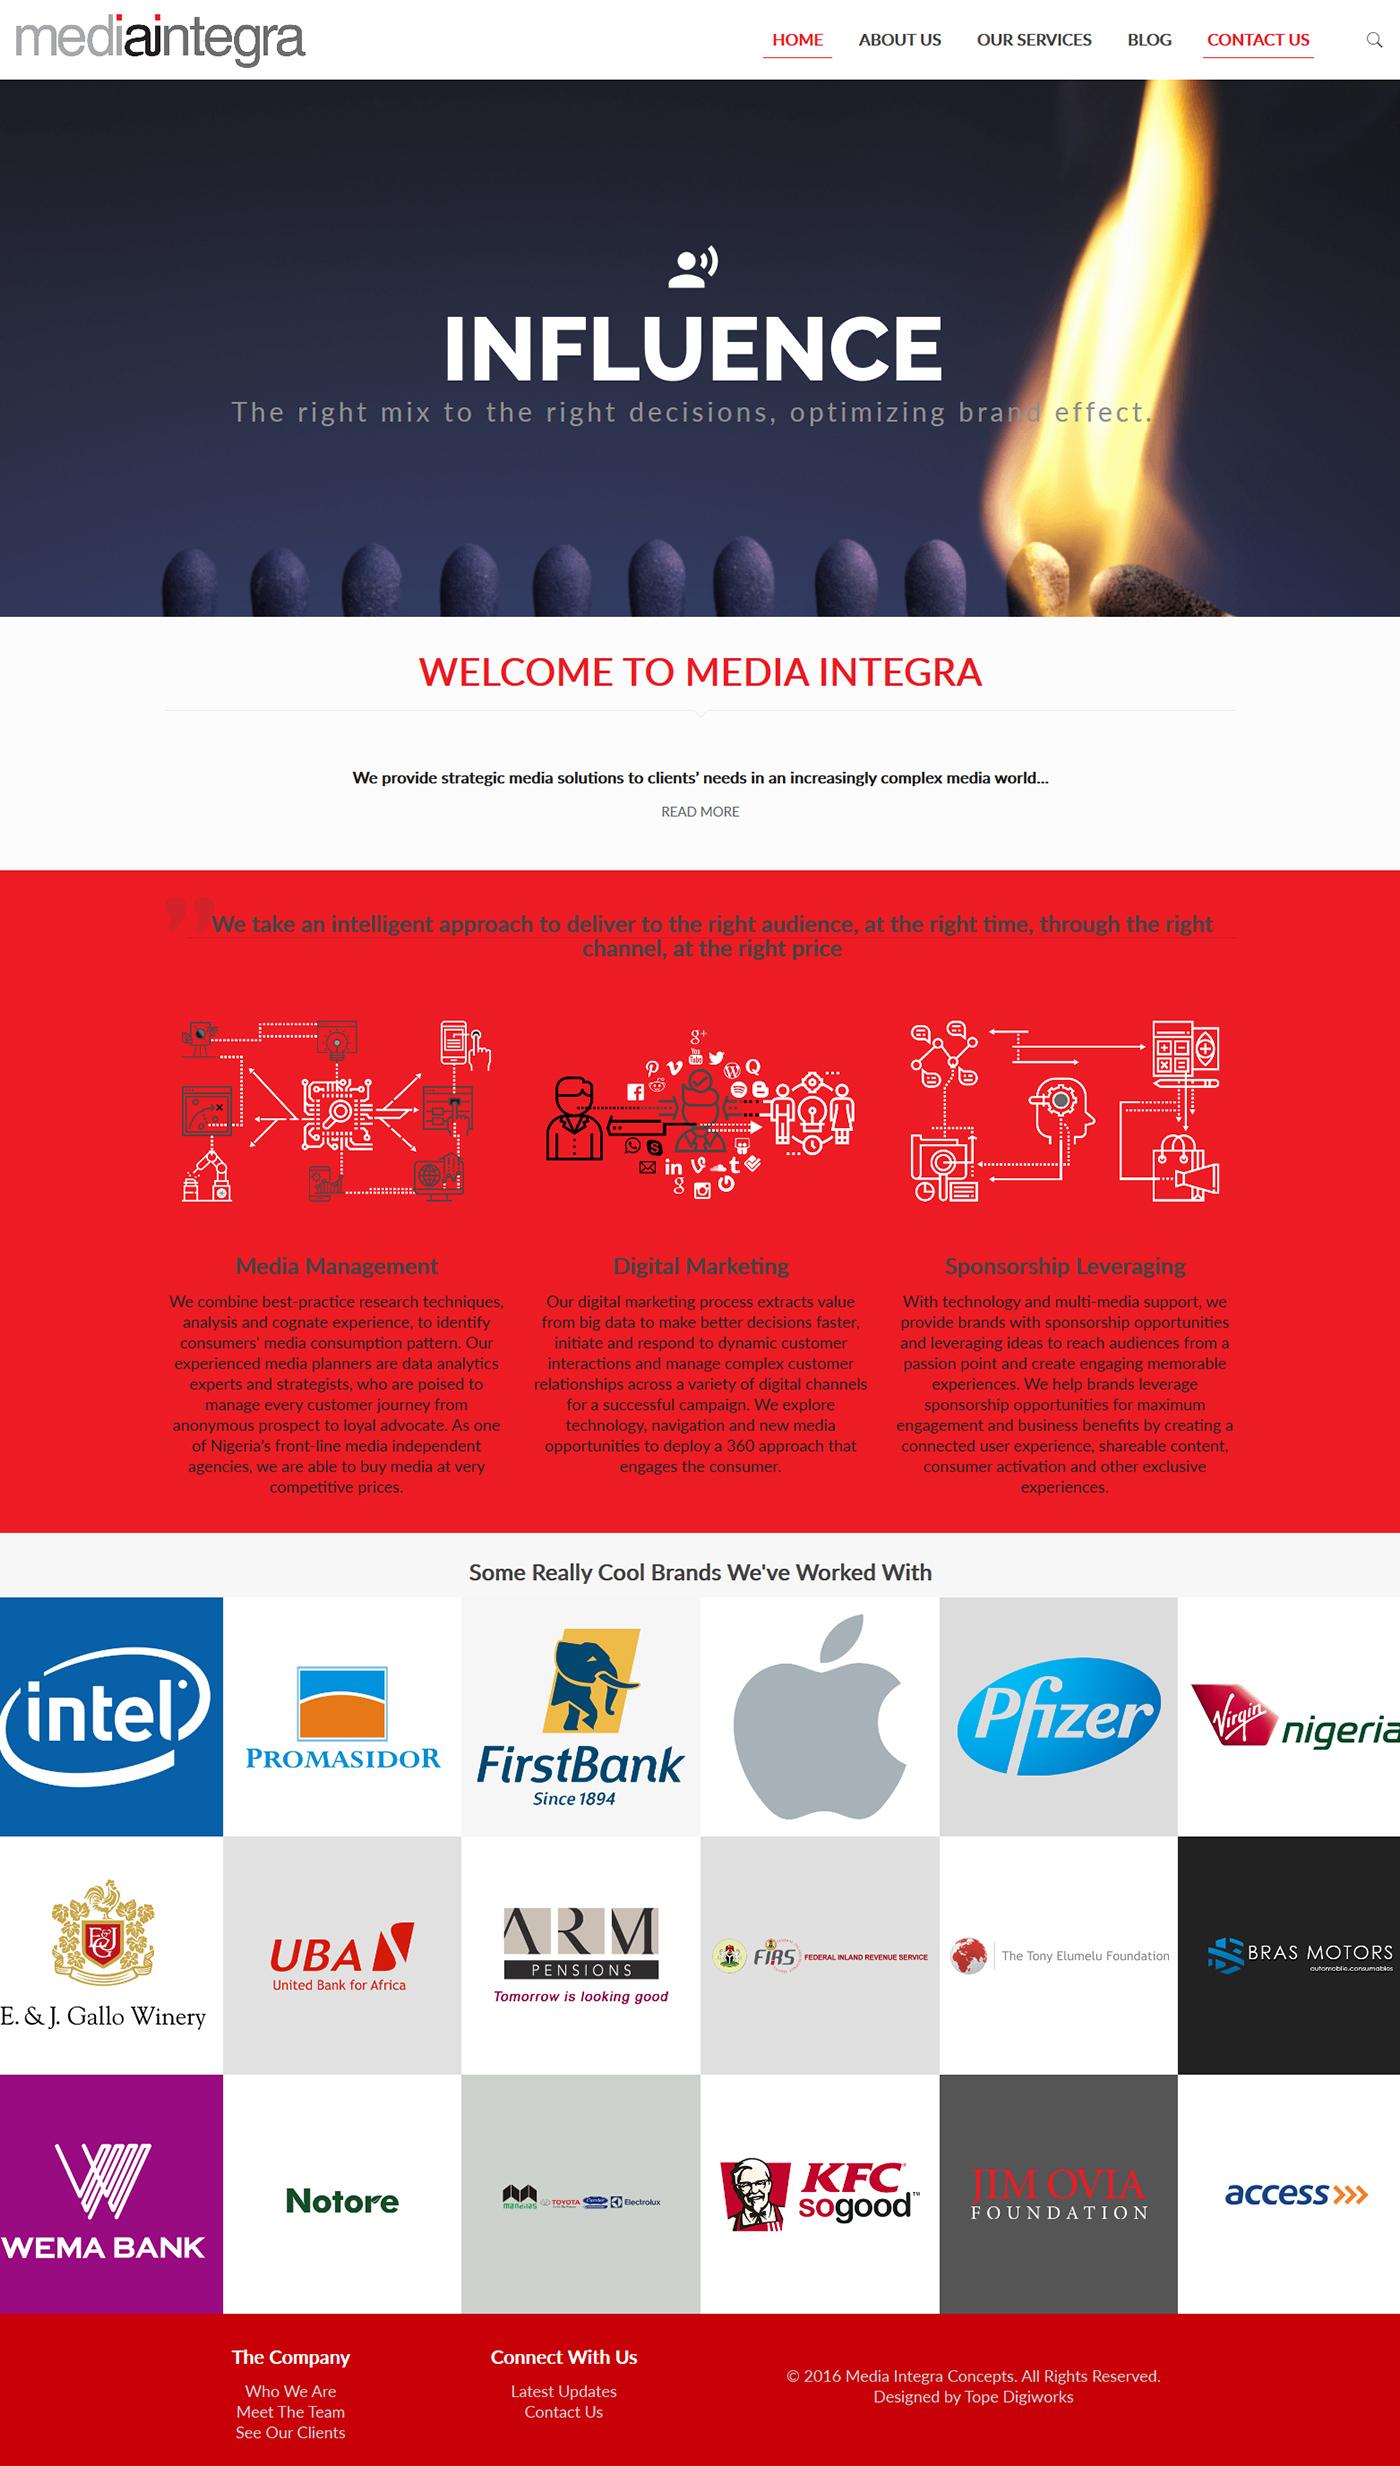 Media Integra Website Design | hoverGENIE